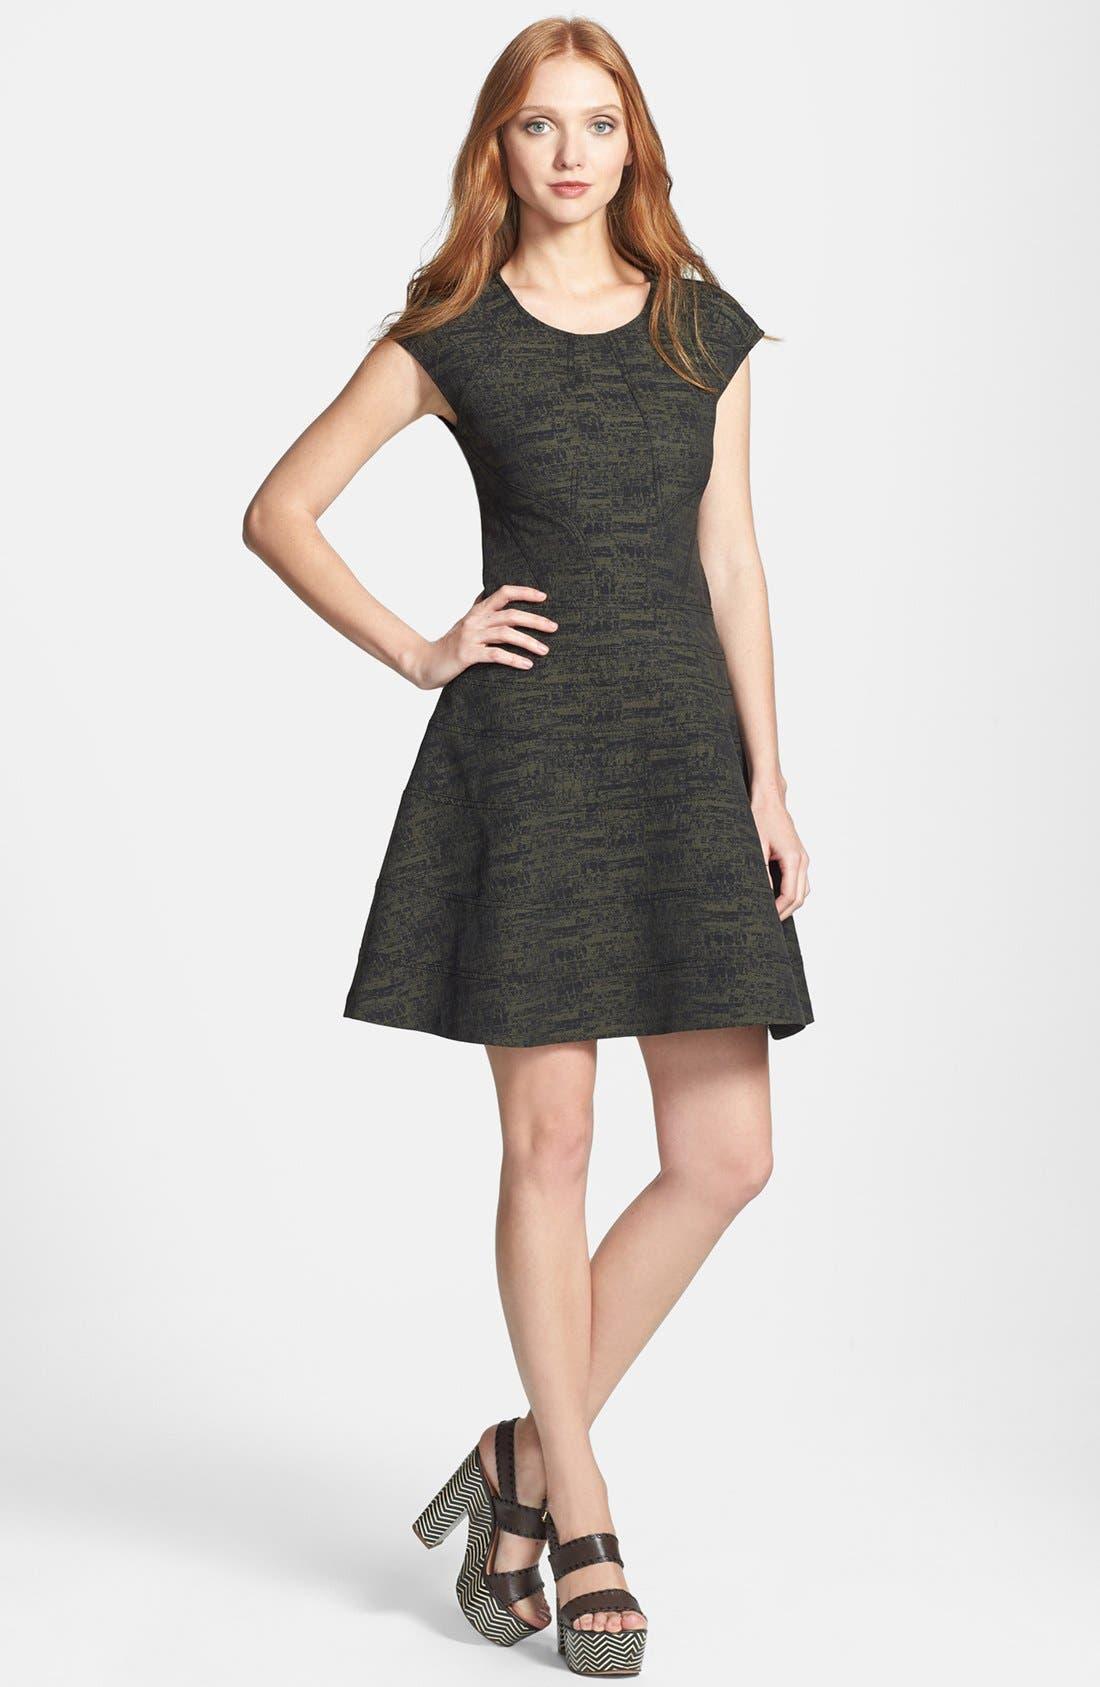 Alternate Image 1 Selected - Diane von Furstenberg 'Rebecca' Woven A-Line Dress